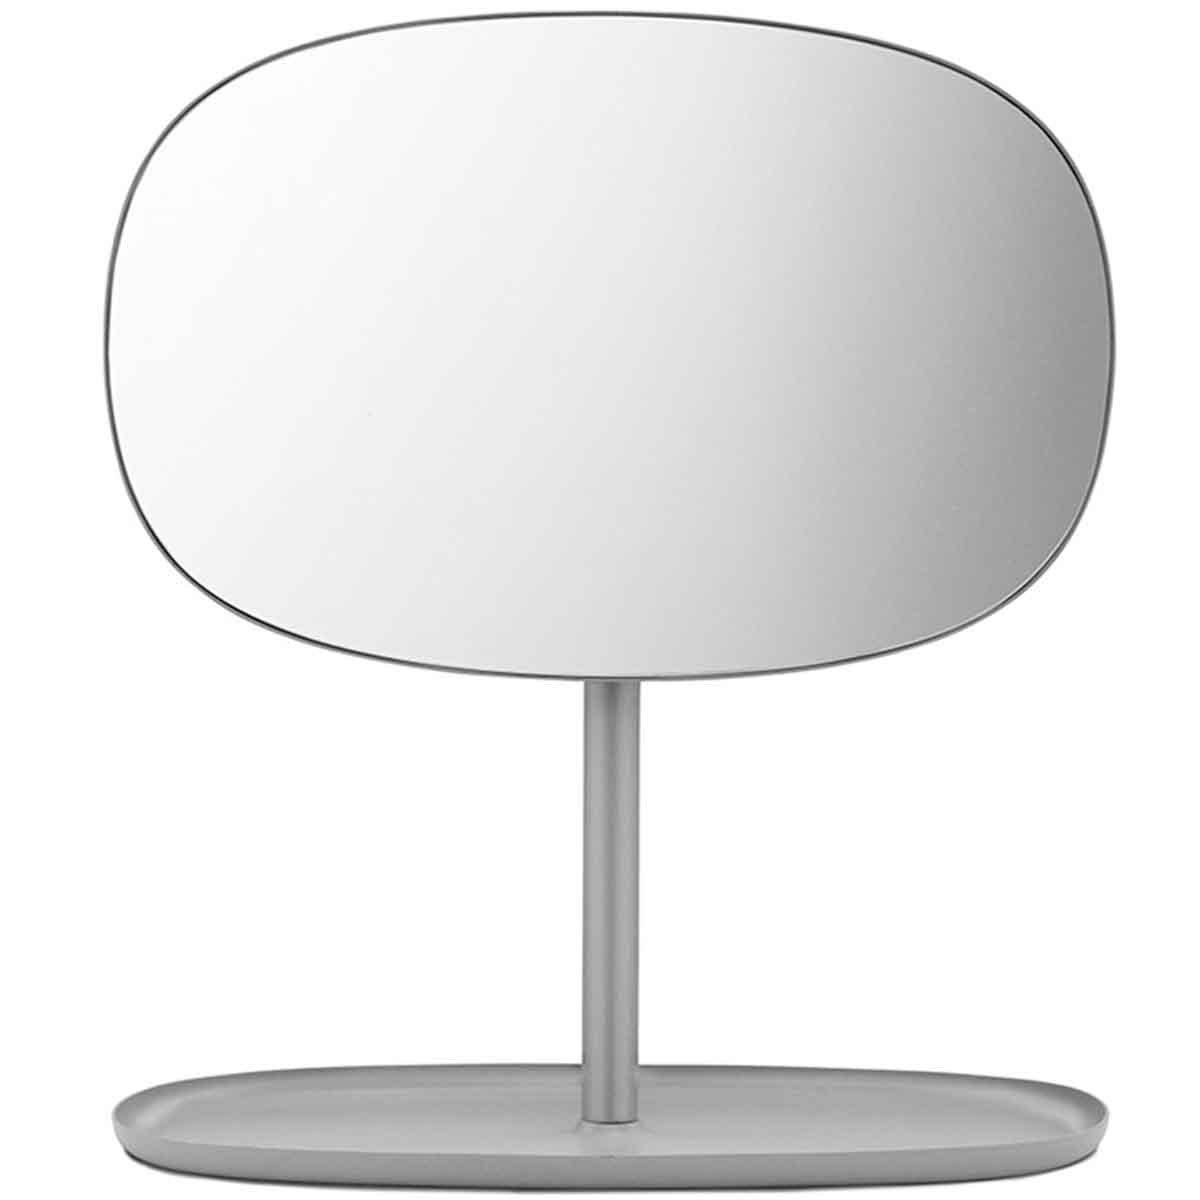 【normann COPENHAGEN】Flip Mirror フリップミラー ノーマン コペンハーゲン (グレー) B01EZAB6ZS グレー グレー